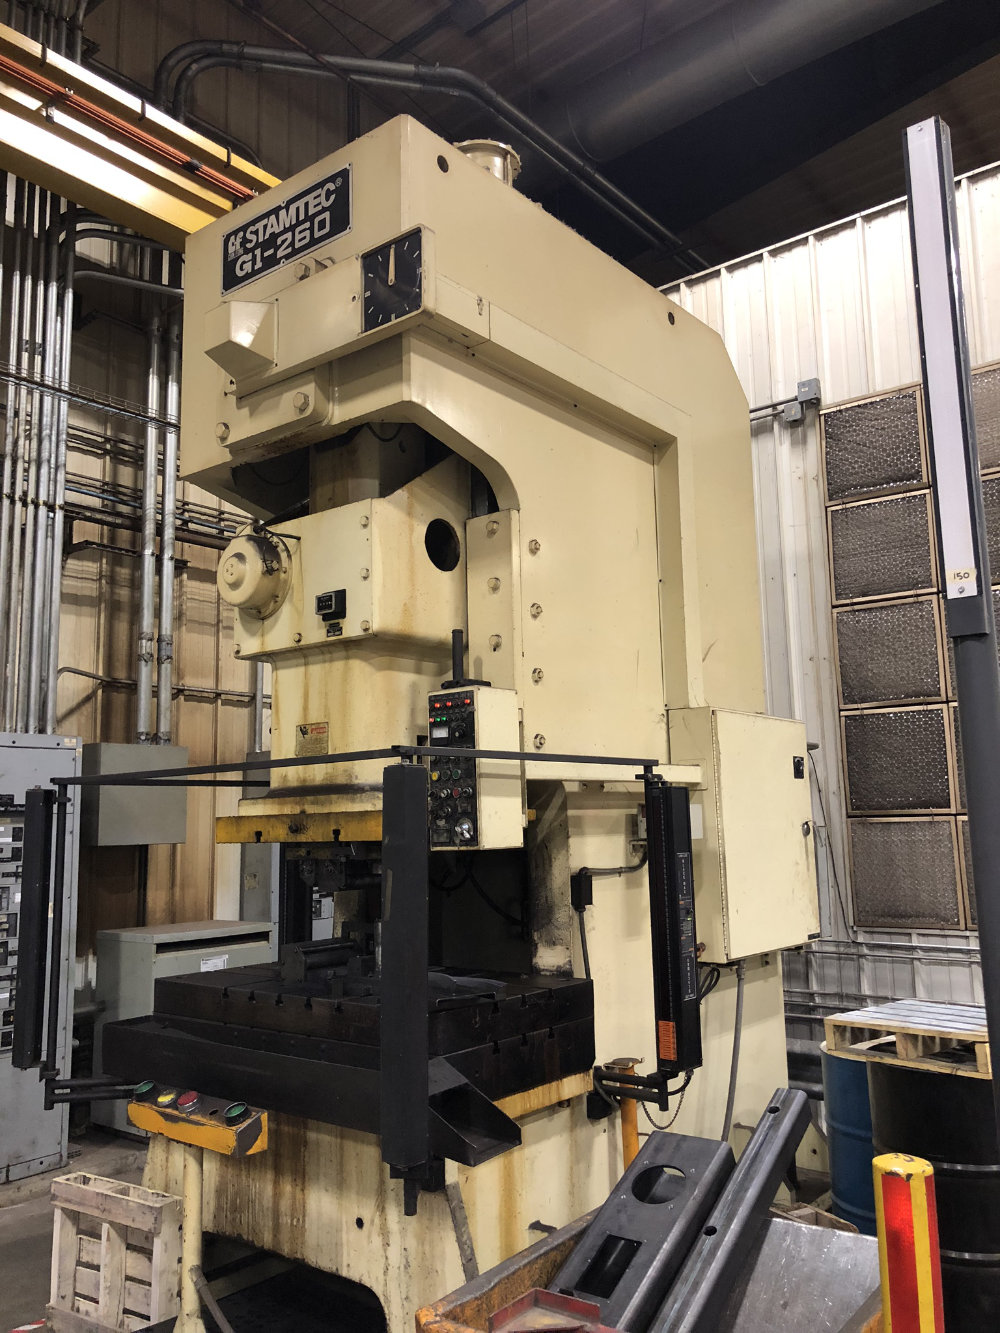 "Stamtec G1-260 Gap Frame Press, 286 Tons, 20-40 SPM, 59"" x 33"" Bed, Air Clutch / Brake - Image 4 of 9"